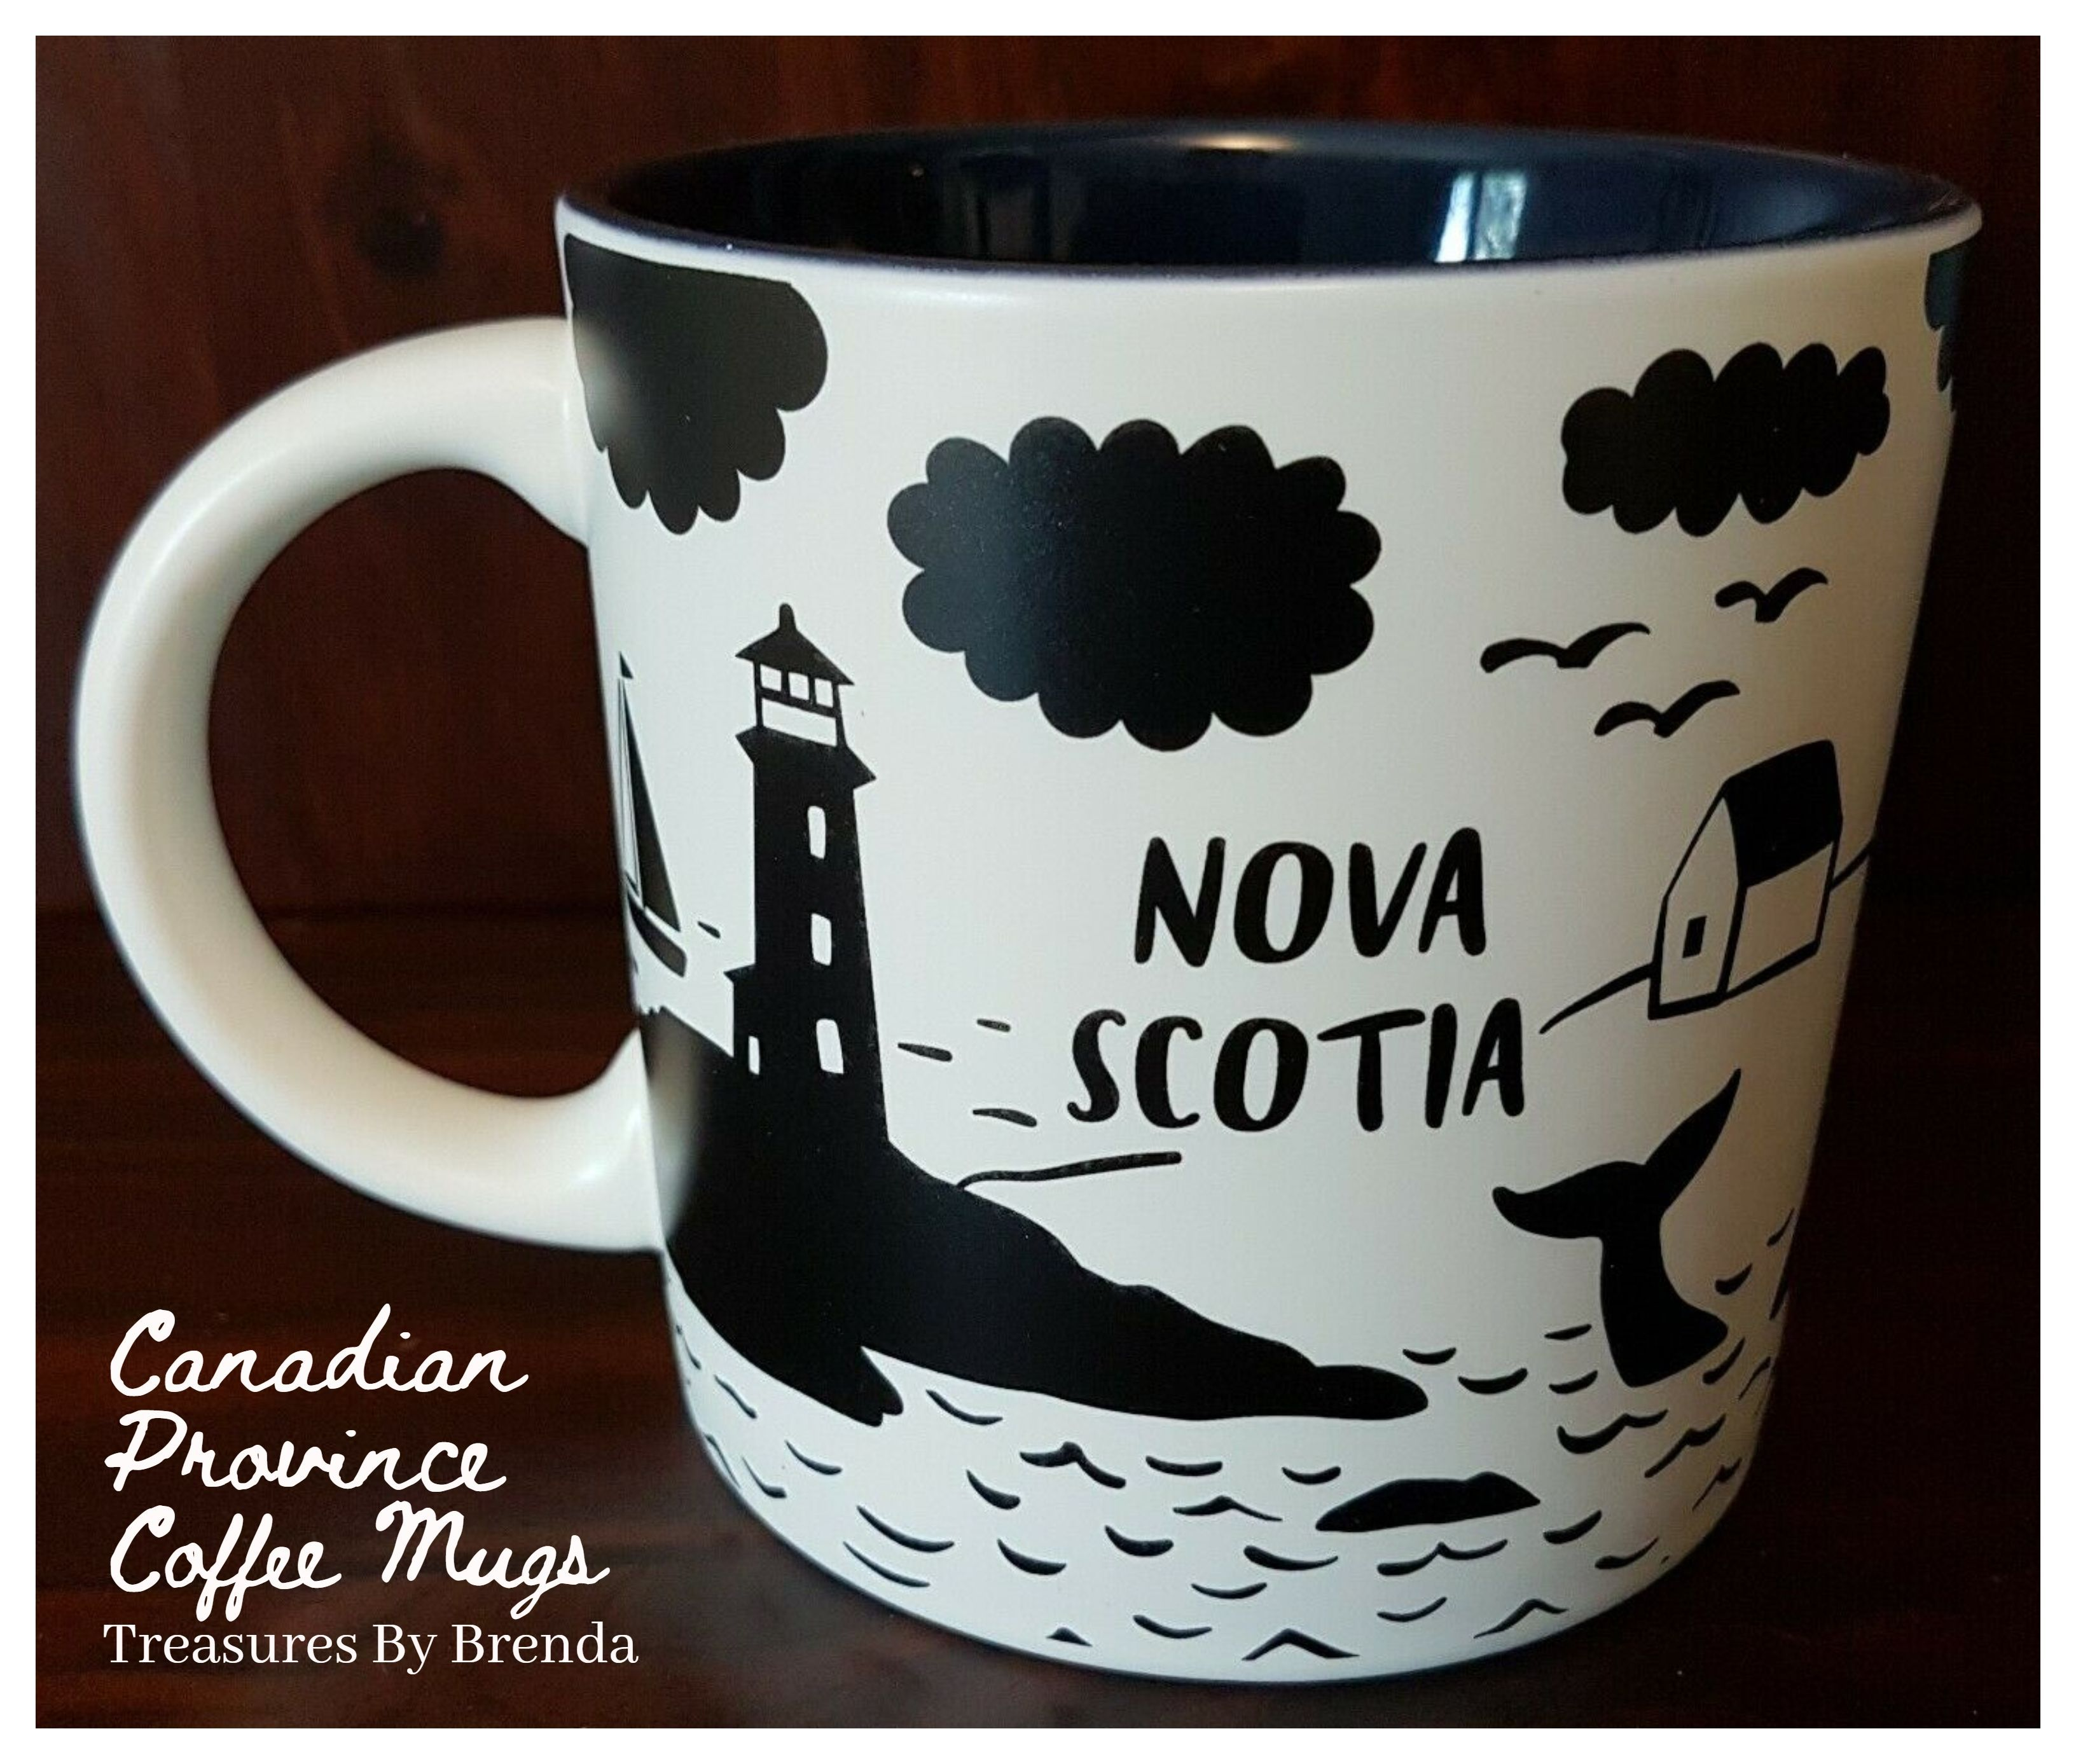 Canadian Province Coffee Mugs Nova Scotia. Celebrate